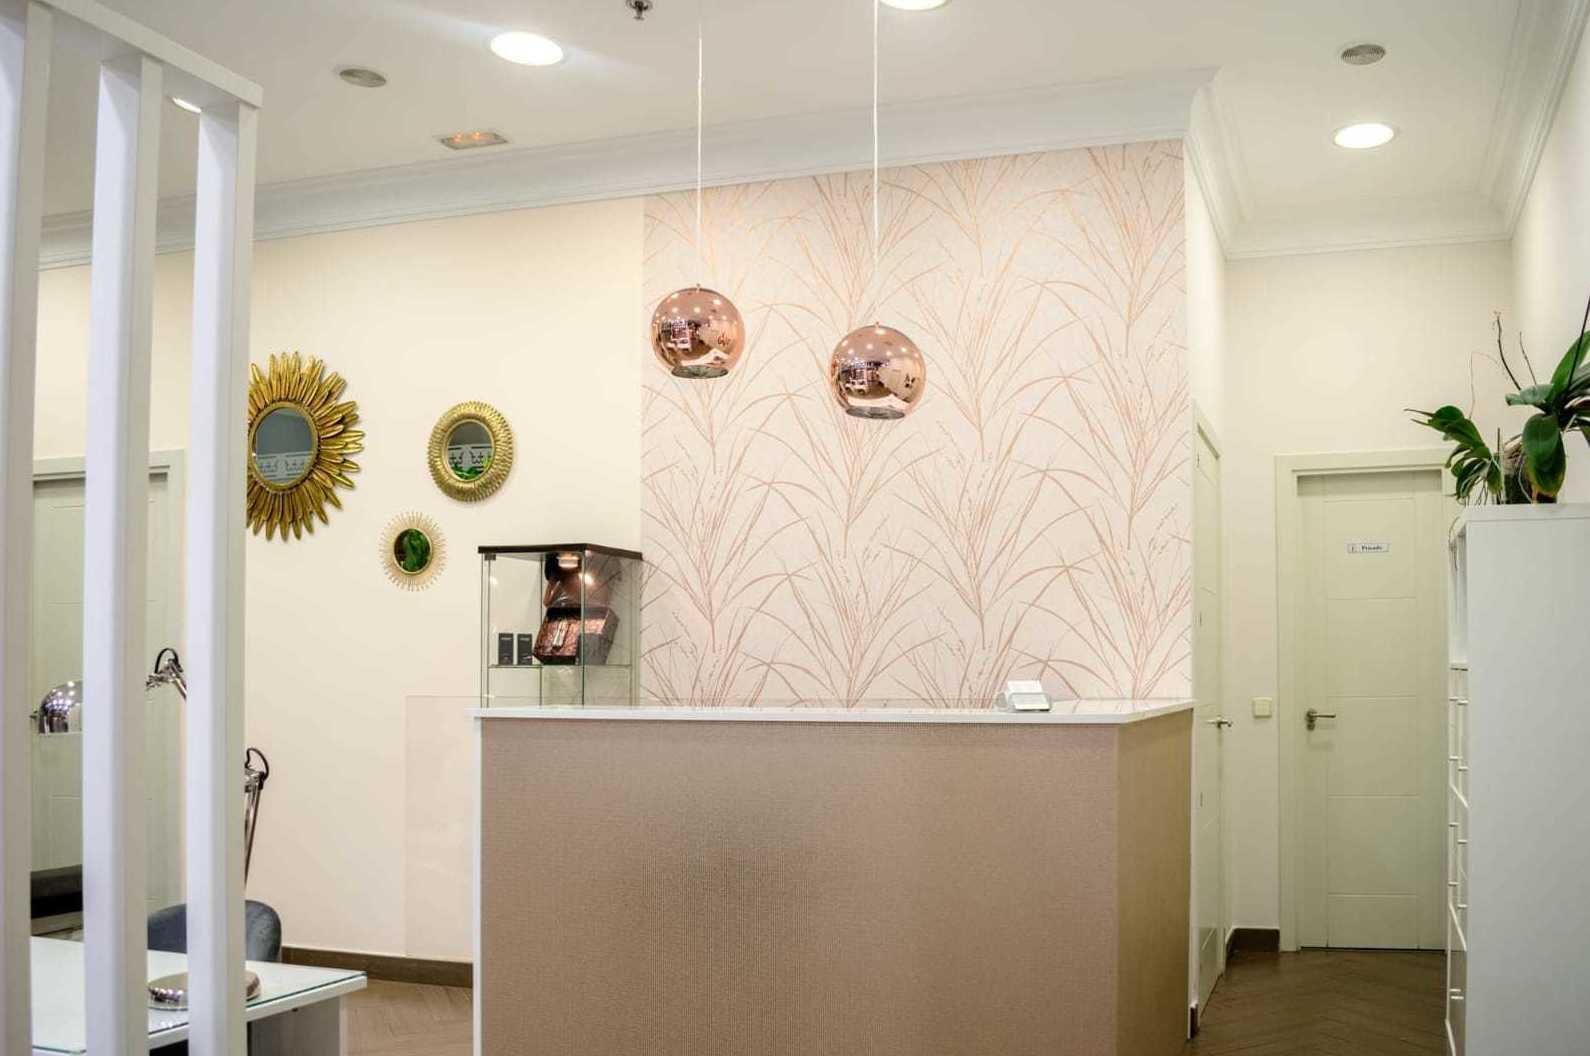 Foto 5 de Centros de estética en Rivas-Vaciamadrid | Centro de Estética Laura Quiroga